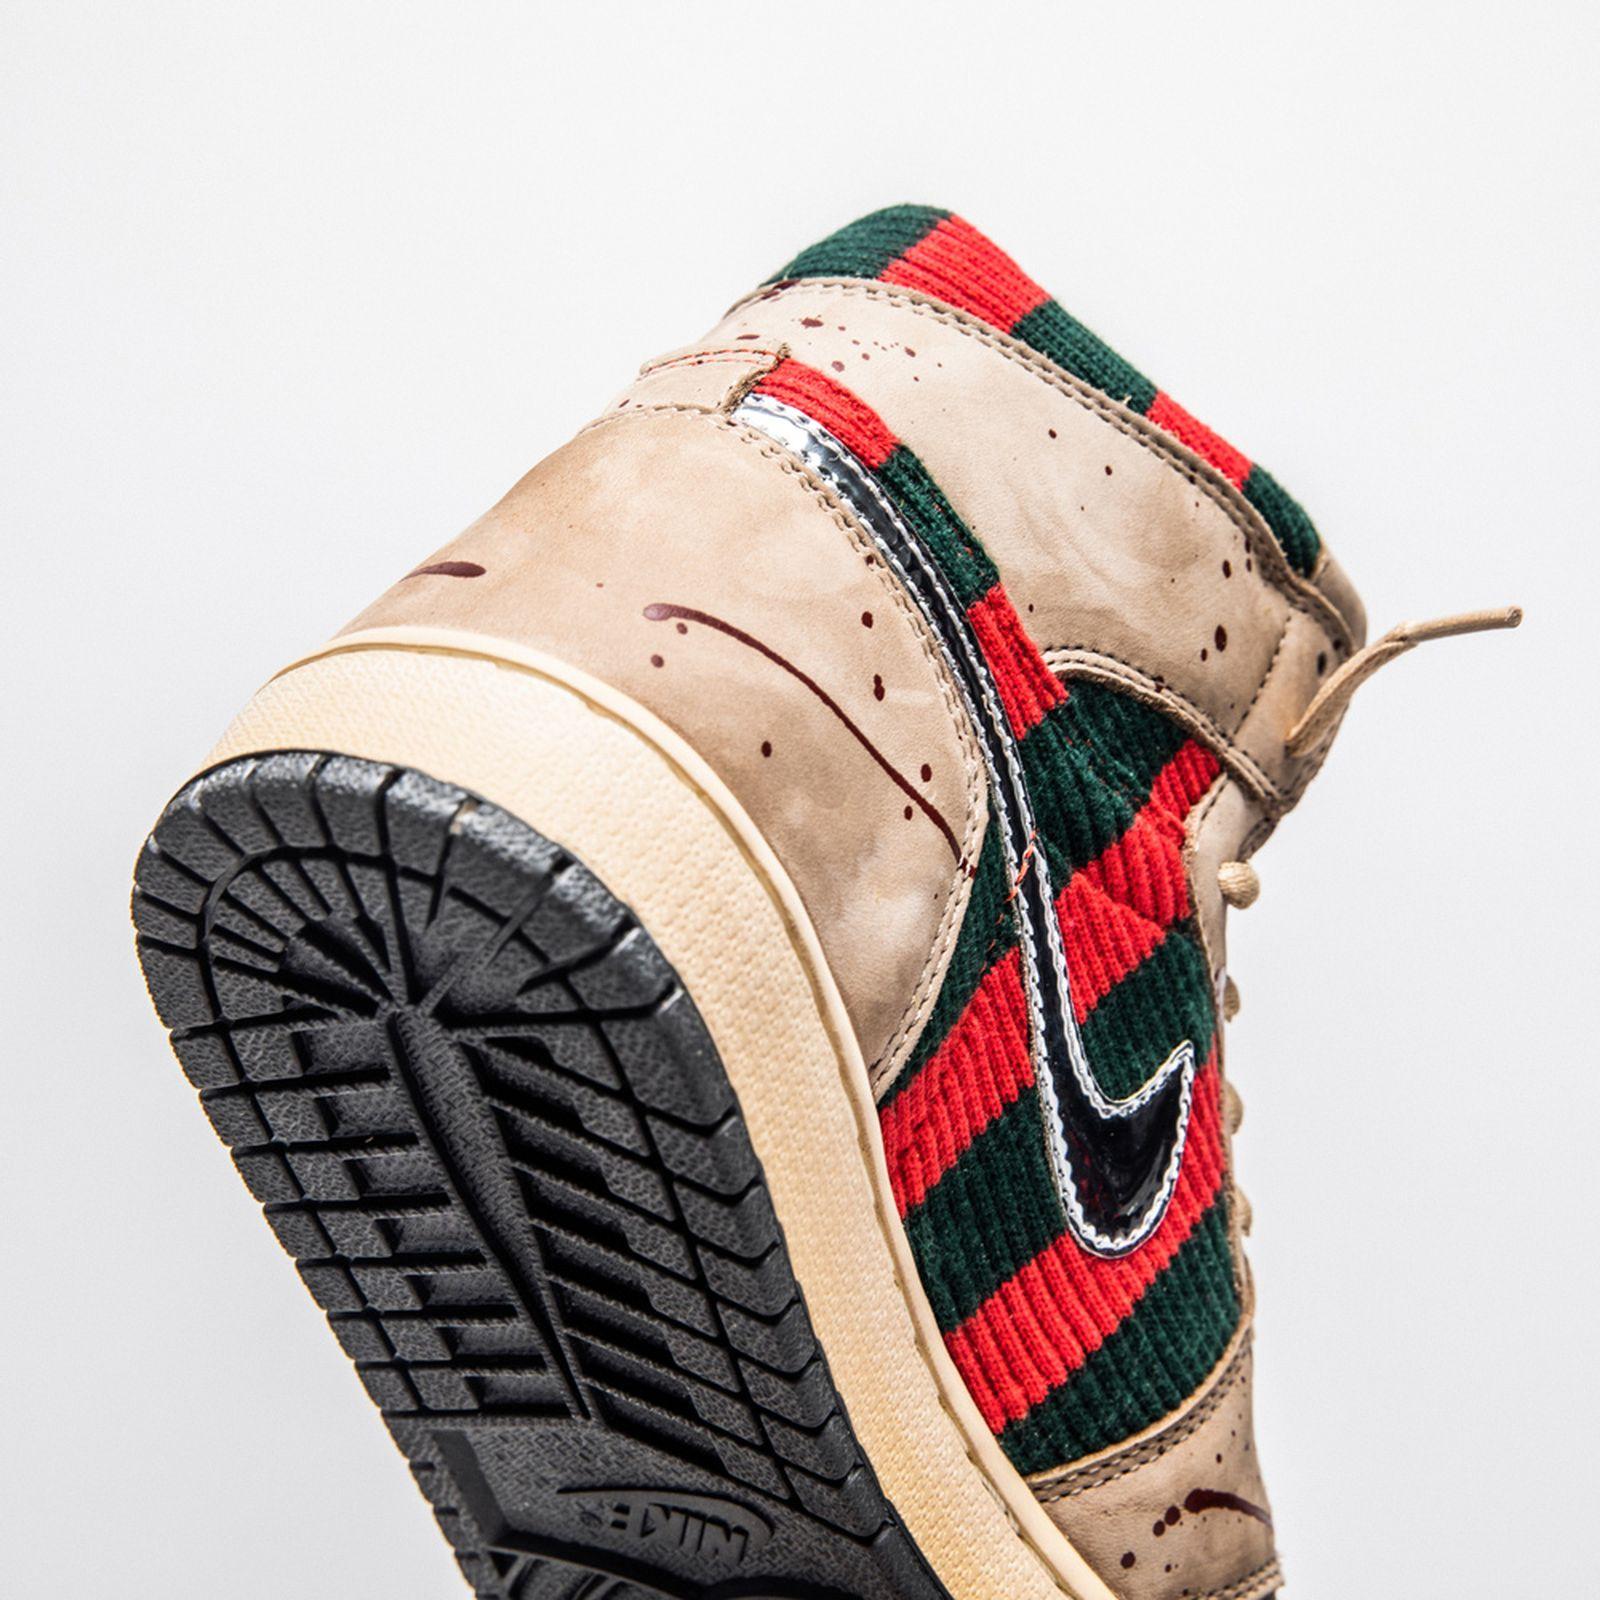 shoe-surgeon-nike-air-jordan-1-freddy-krueger-release-date-price-07